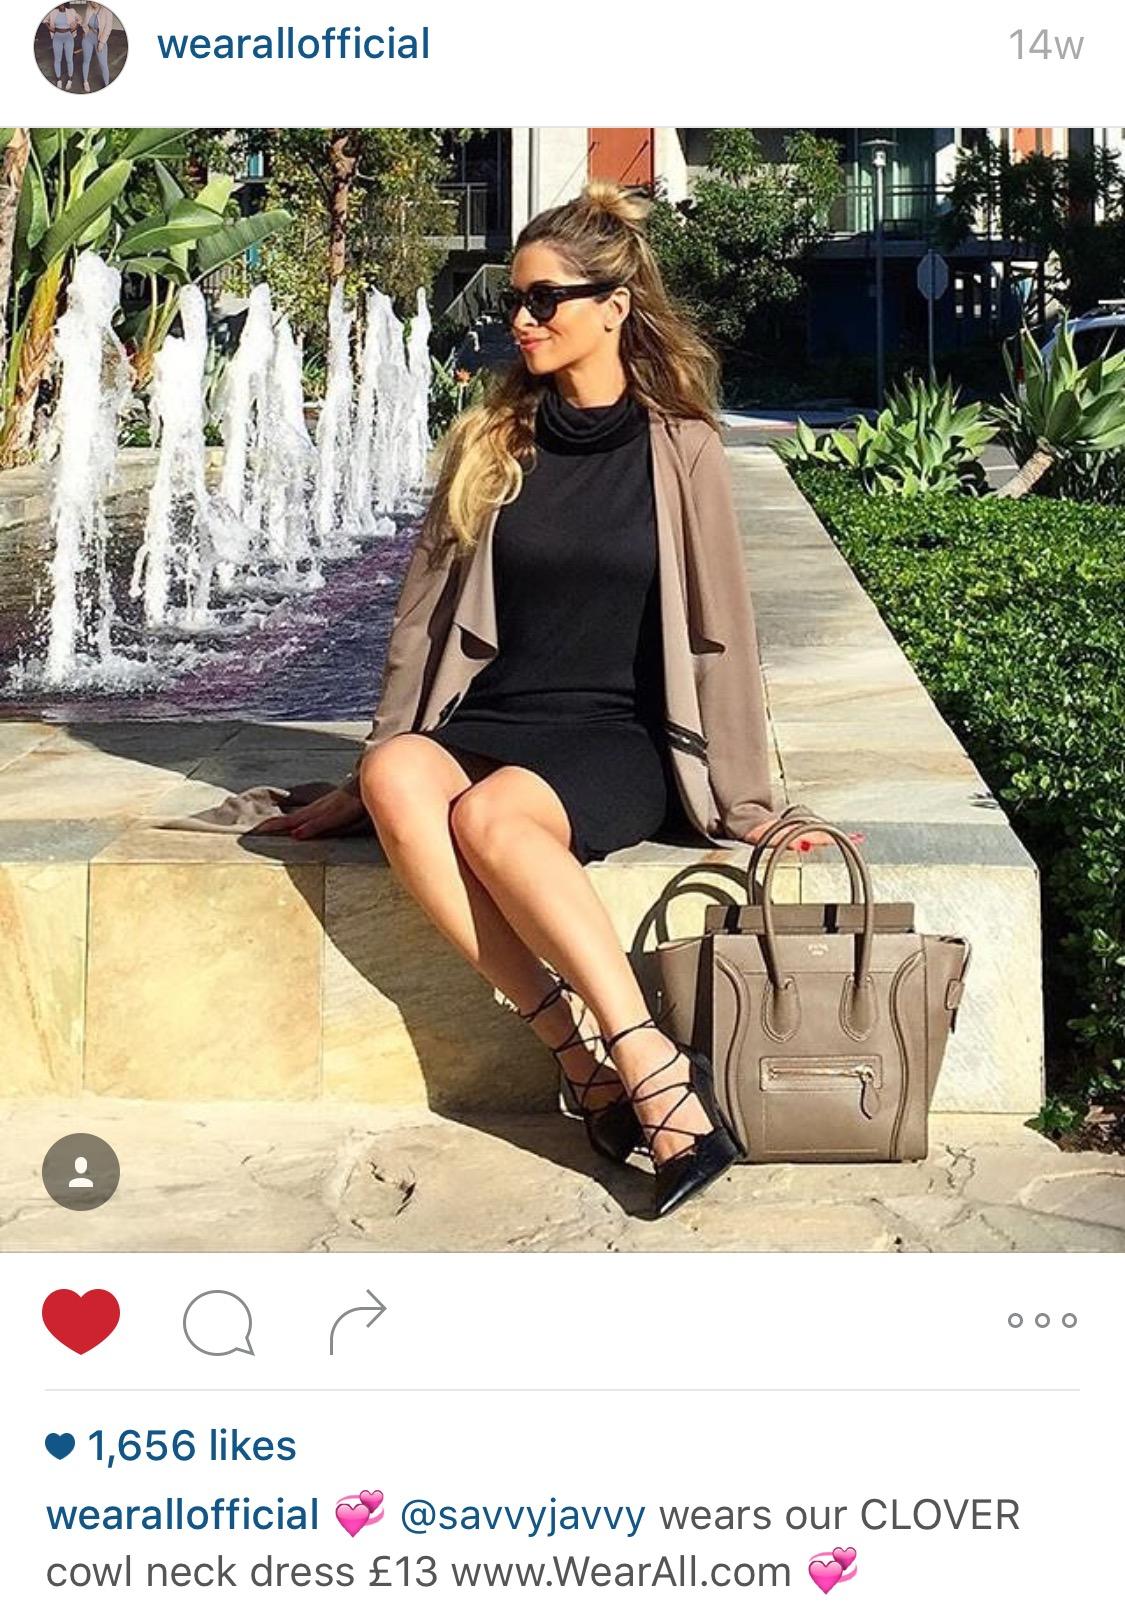 Wear All Official Instagram